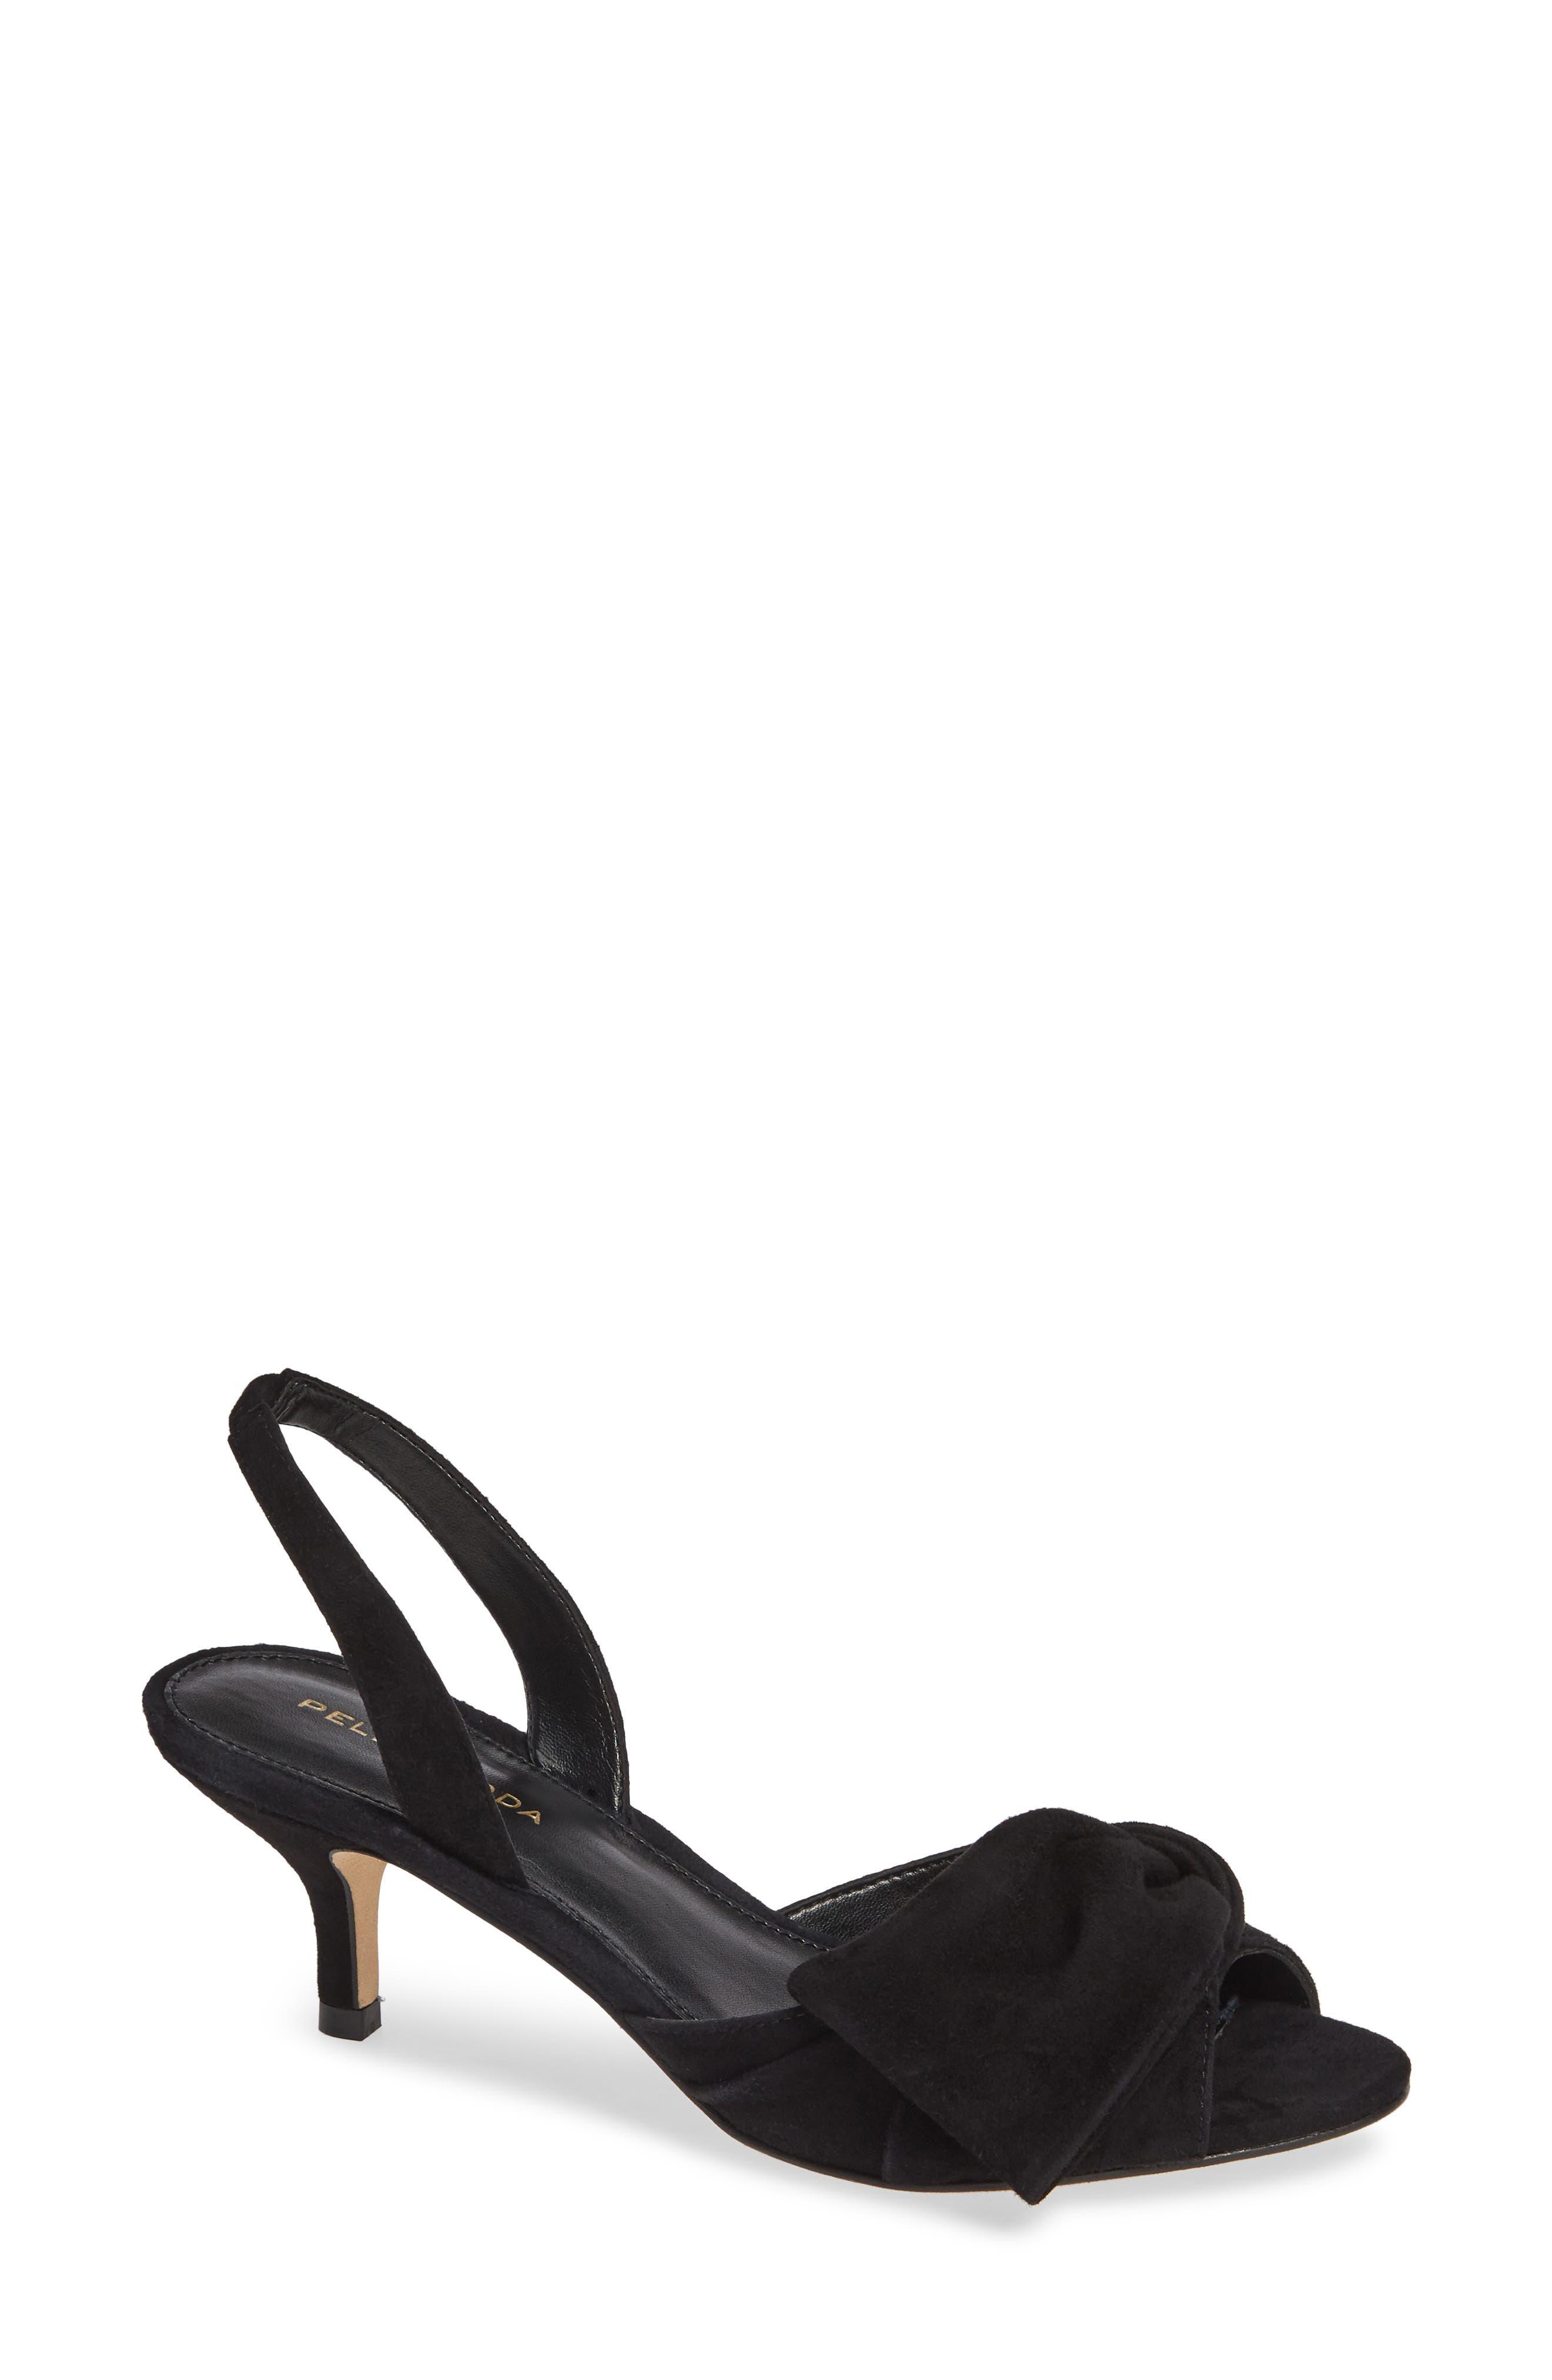 PELLE MODA Lovi Sandal, Main, color, BLACK